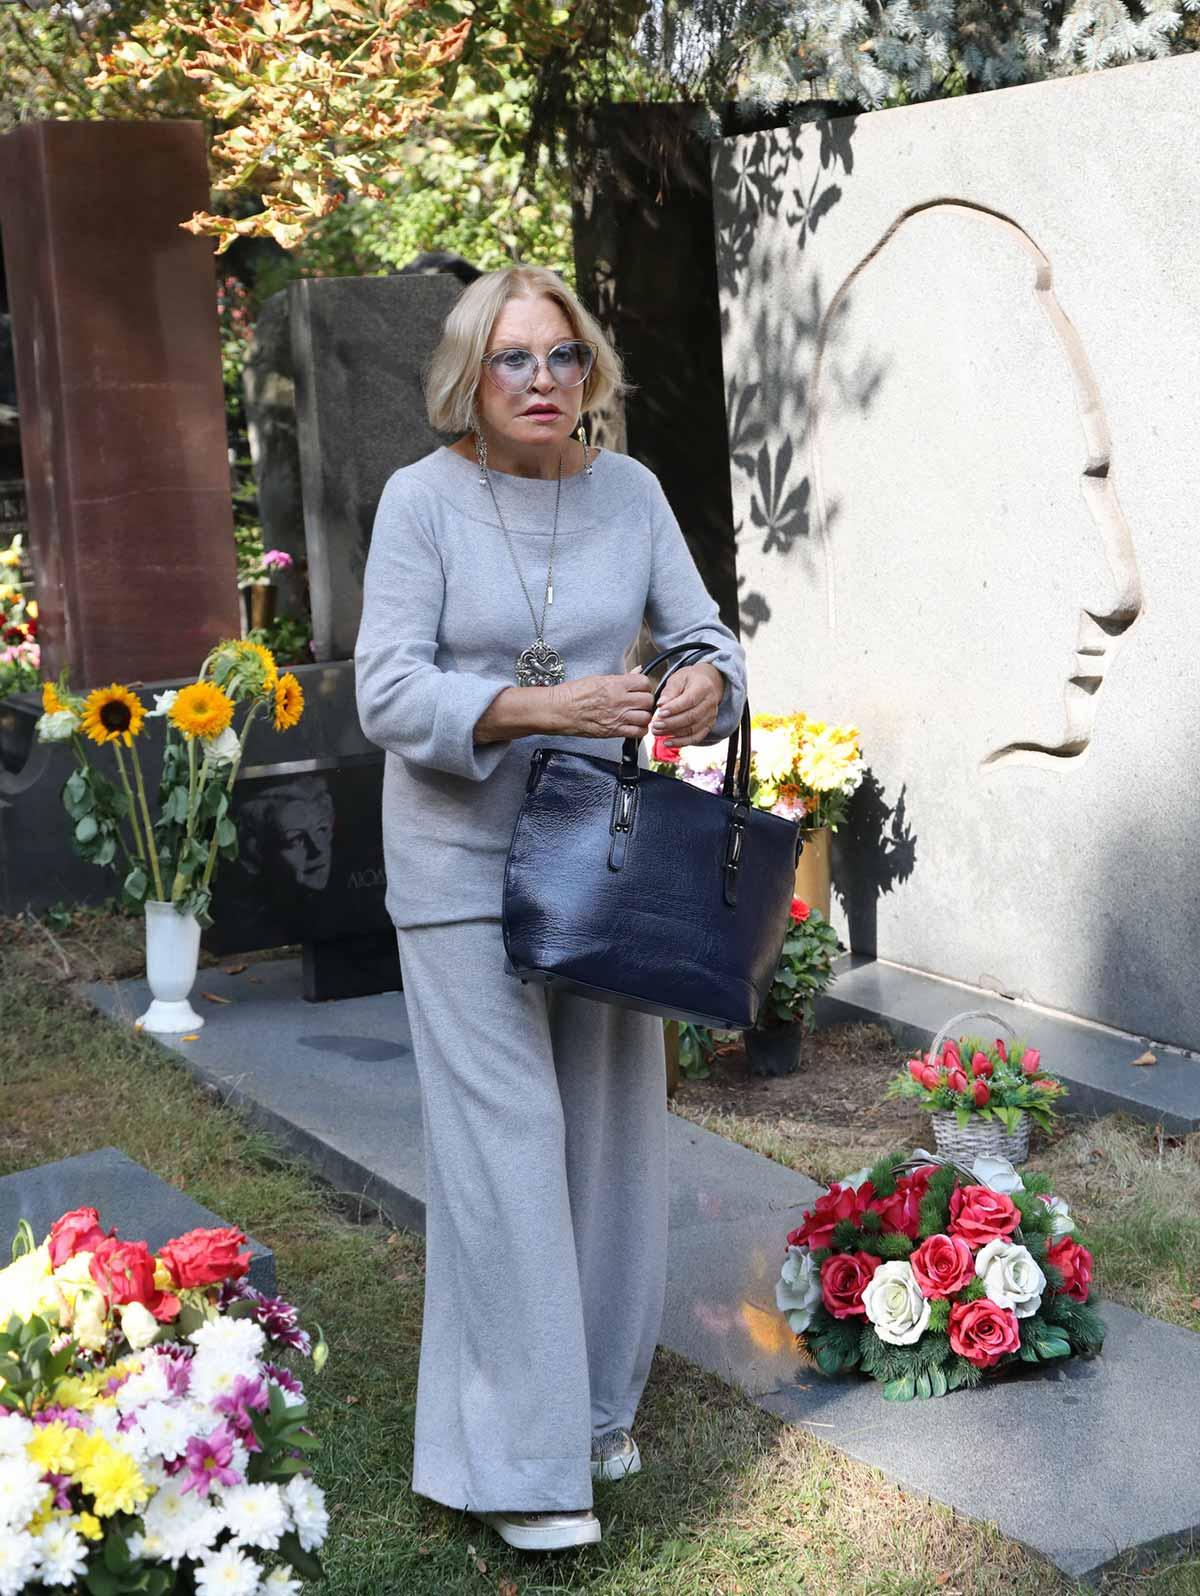 https://s8.cdn.eg.ru/wp-content/uploads/2019/09/lyudmila-maksakova-1044039.jpg